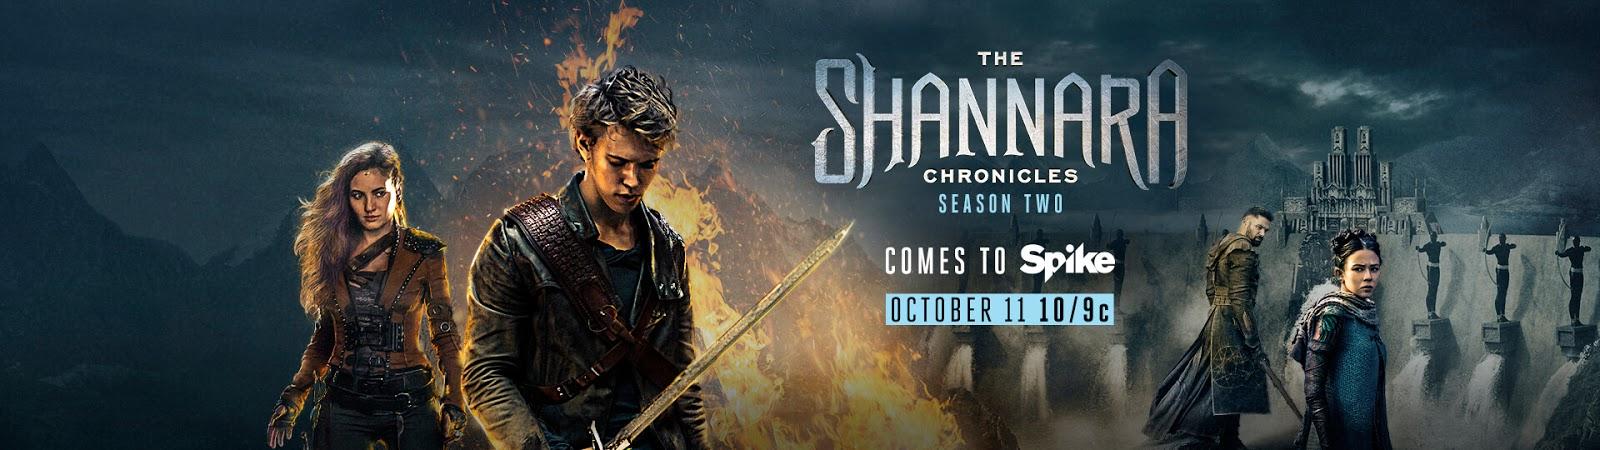 The Shannara Chronicles Sezonul 2 online